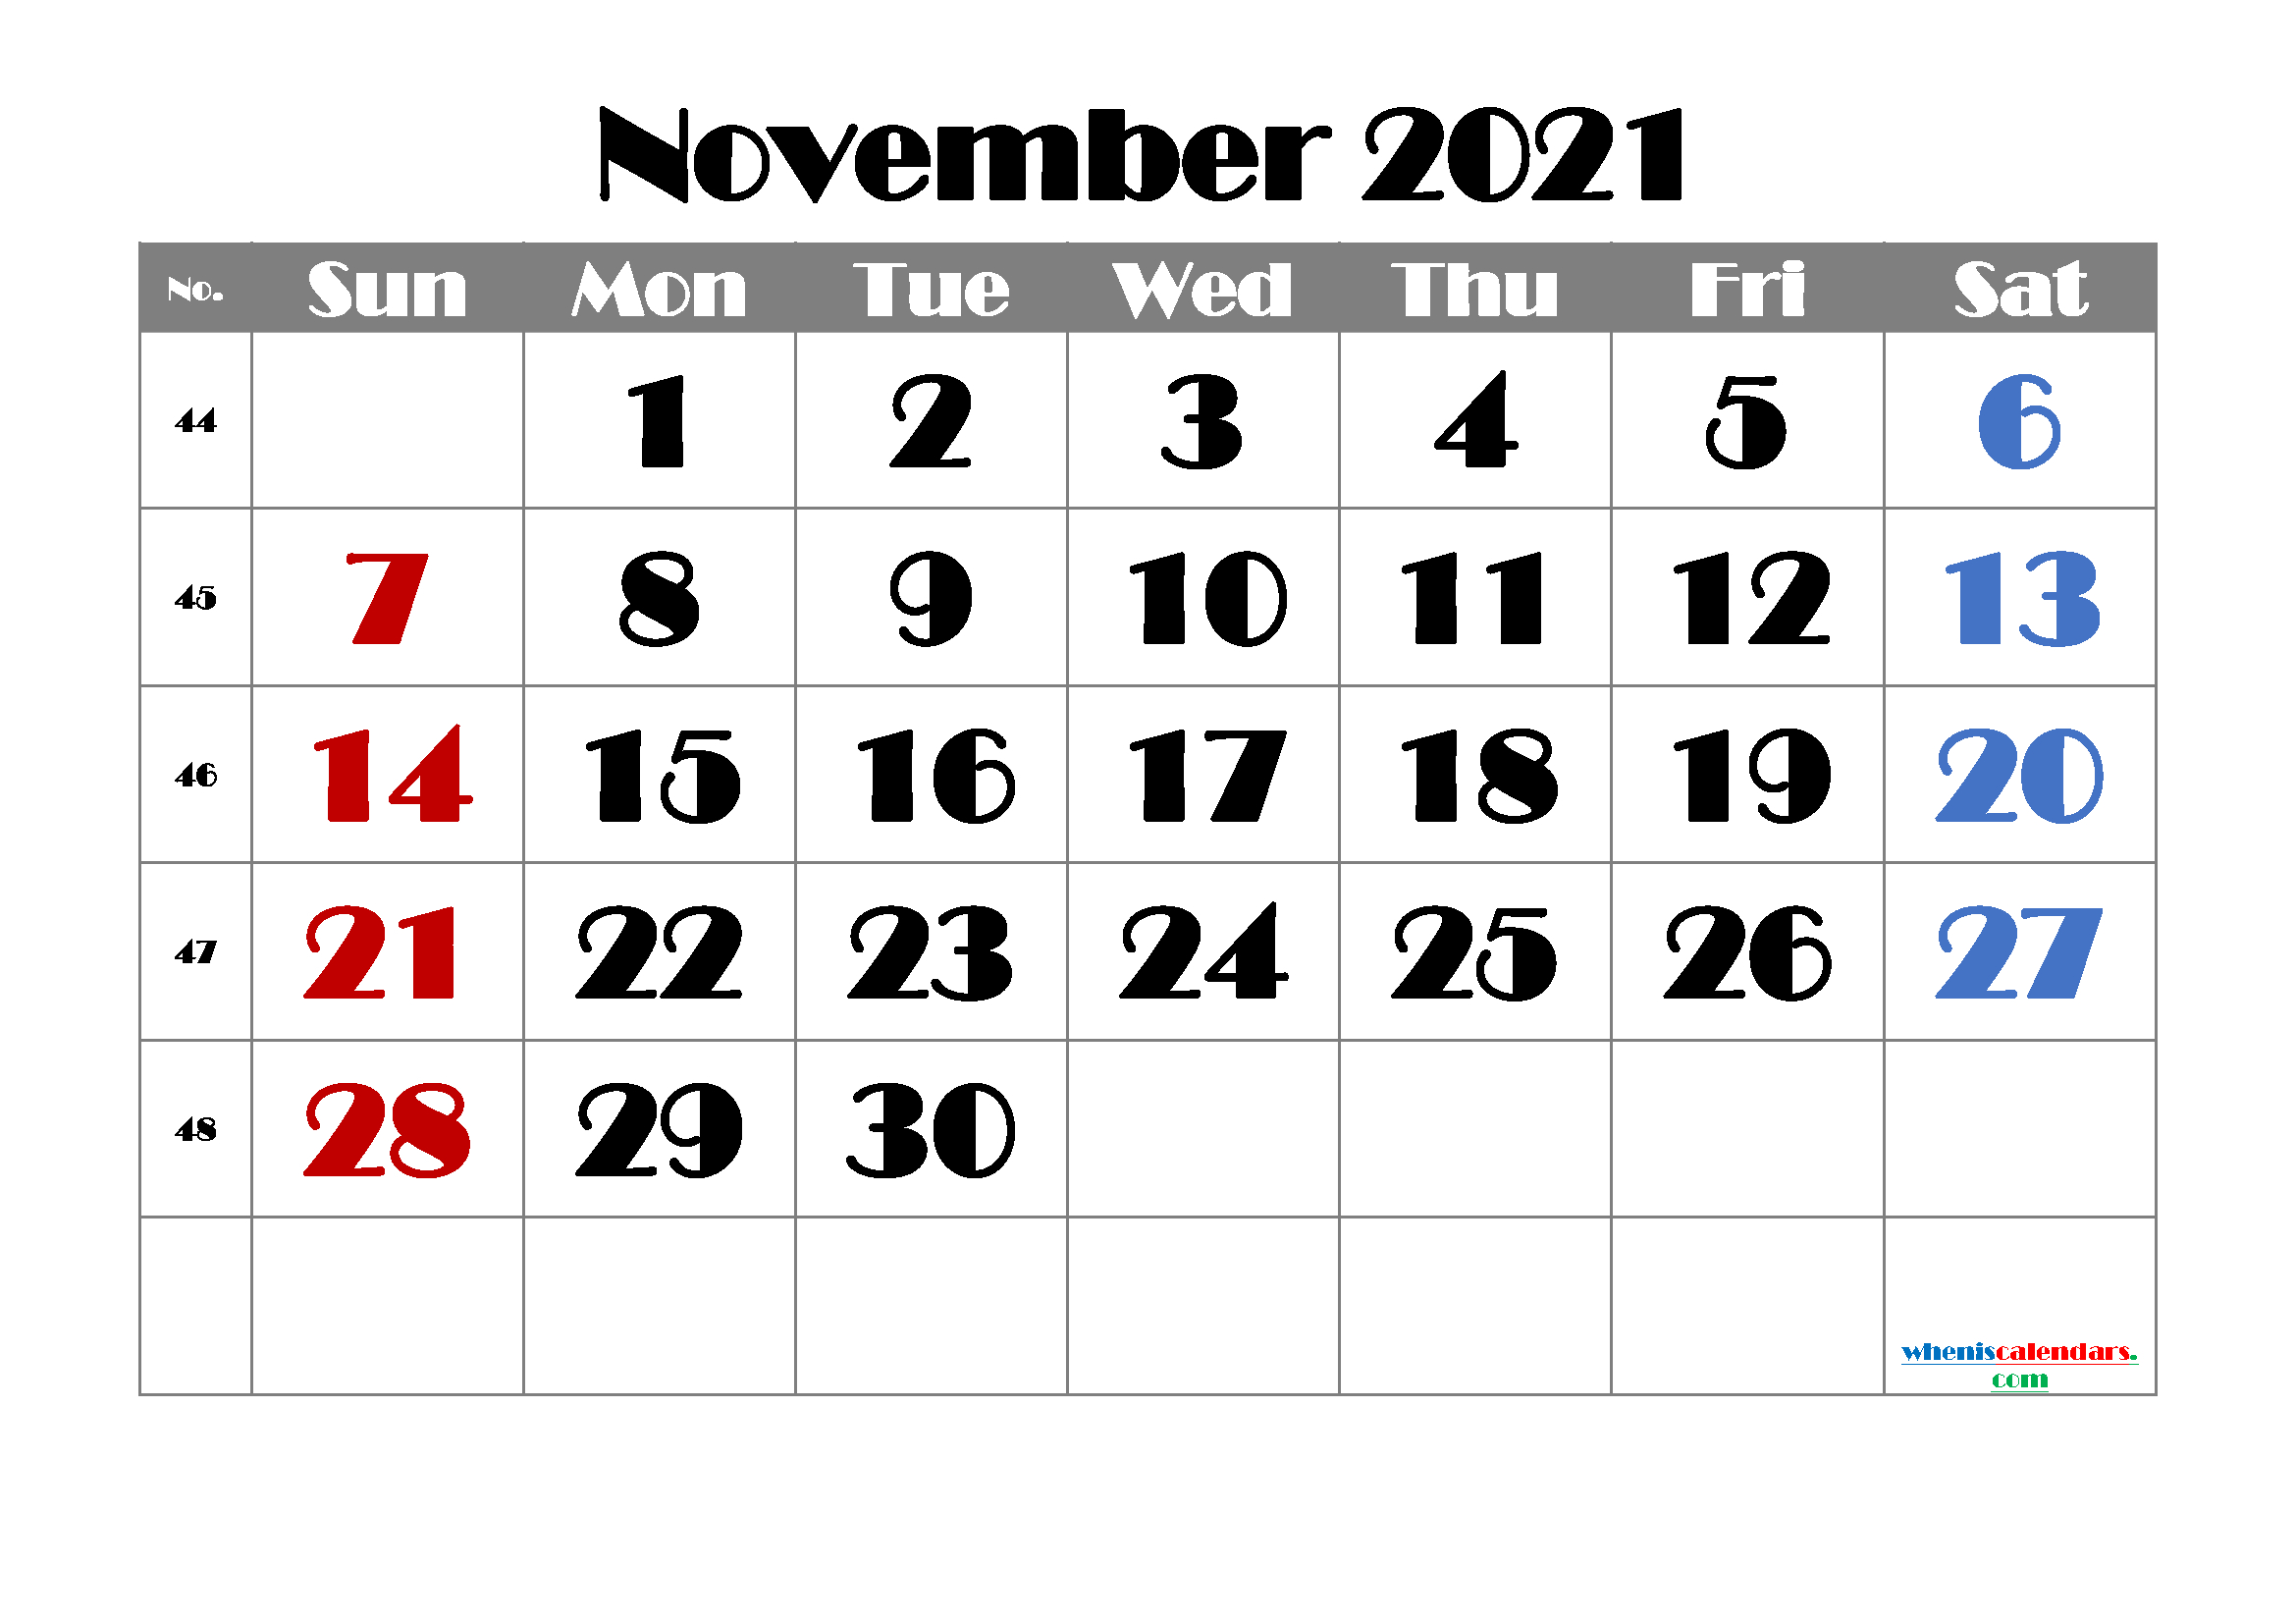 Free Printable November 2021 Calendar   Template M21Broadway1 November 2021 Calendar To Print